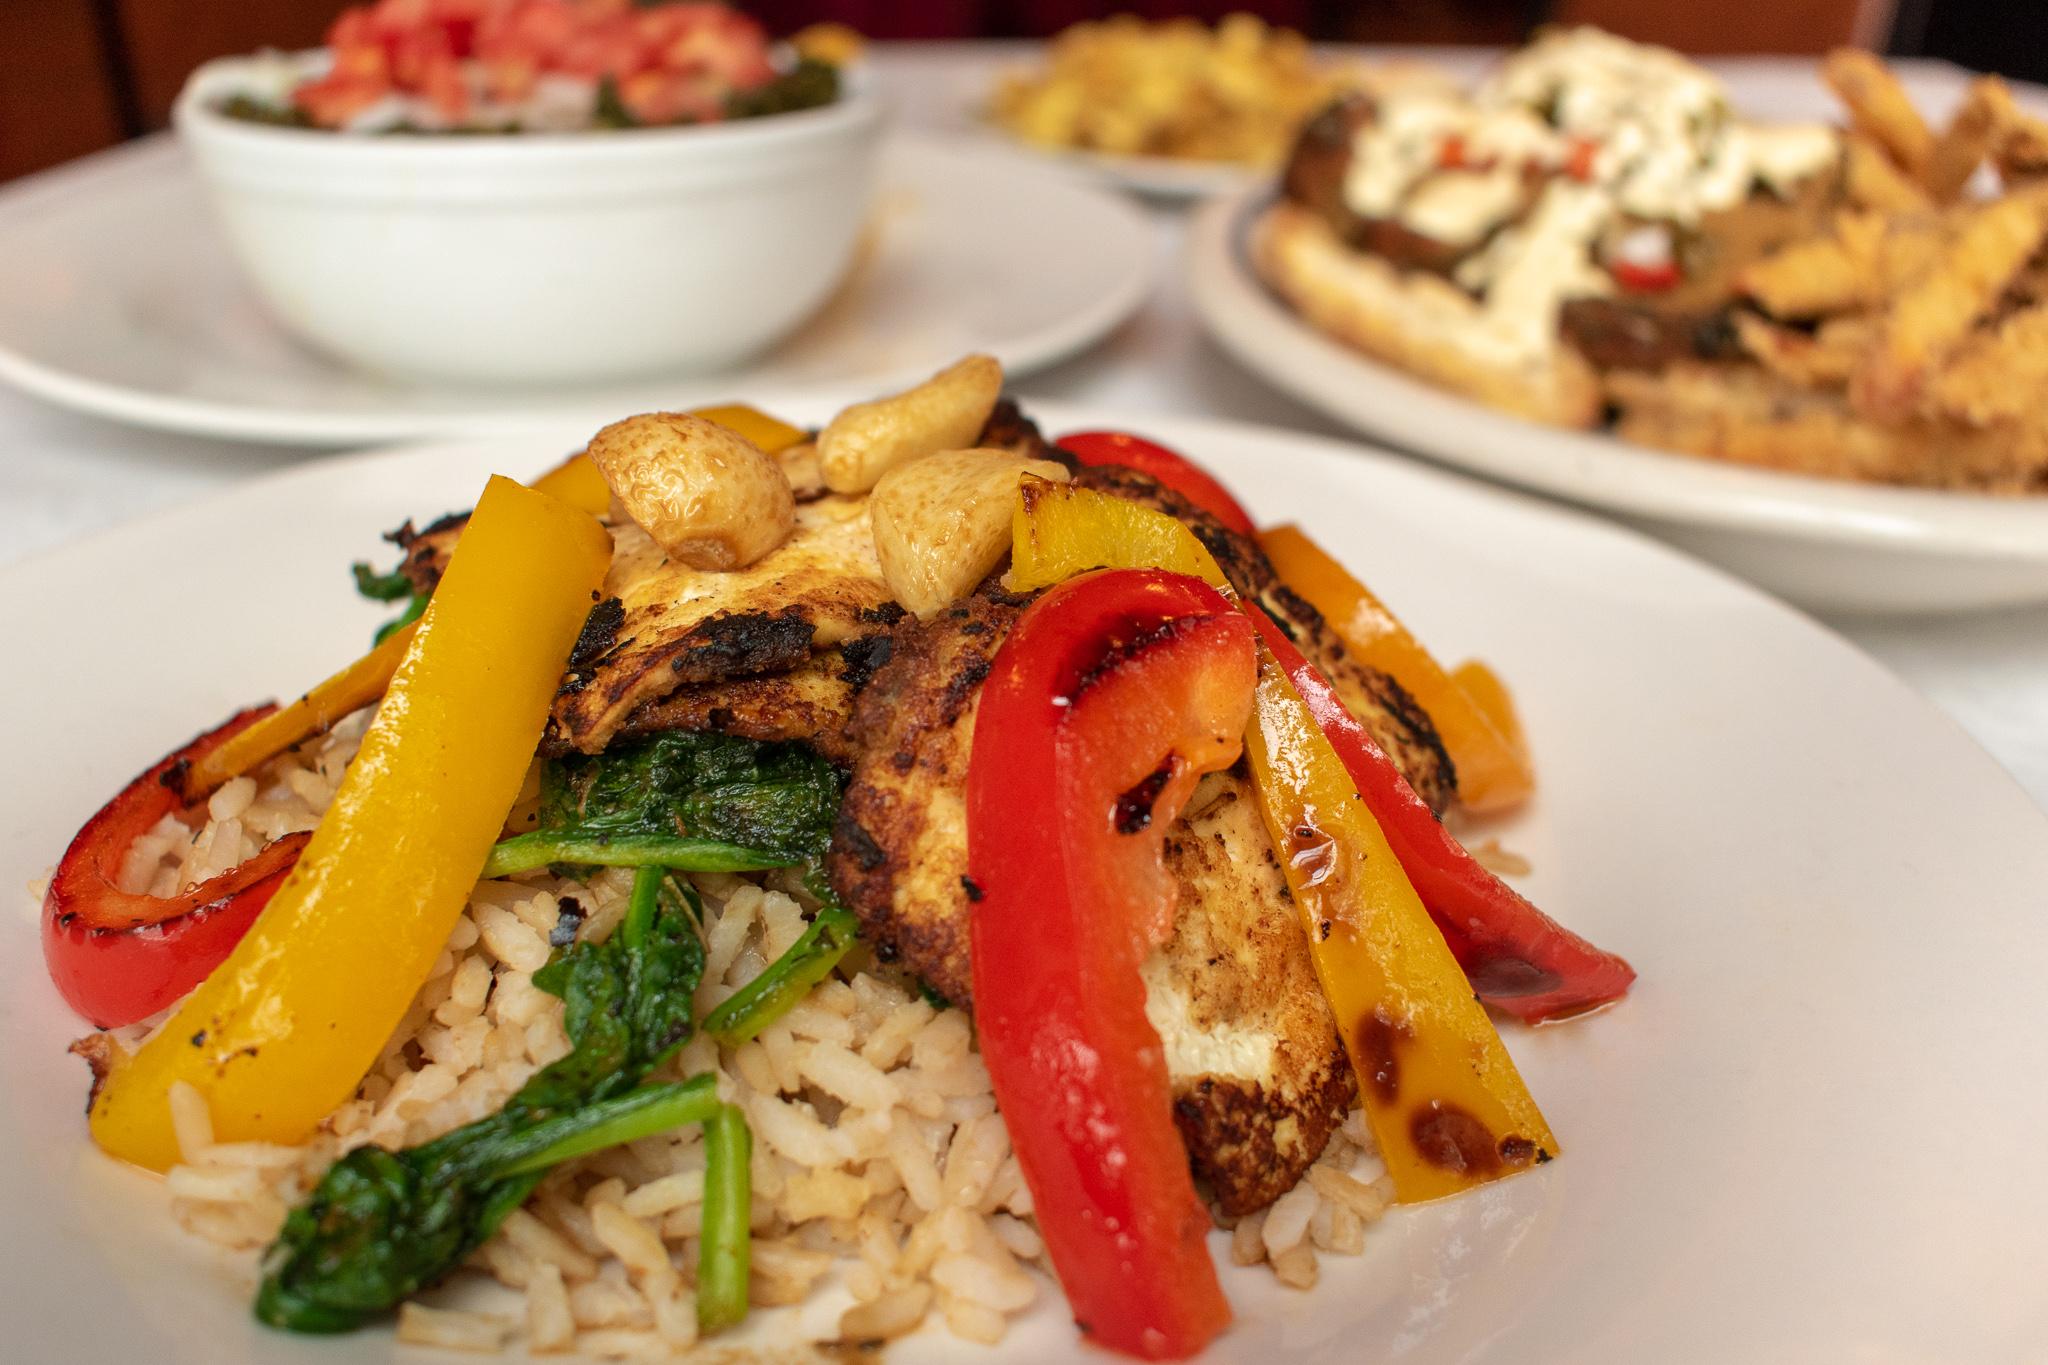 Uprooted-Traveler-Vegan-Food-Guide-Chicago-Origional-Soul-Vegetarian-tofu-creole-blacked.jpg